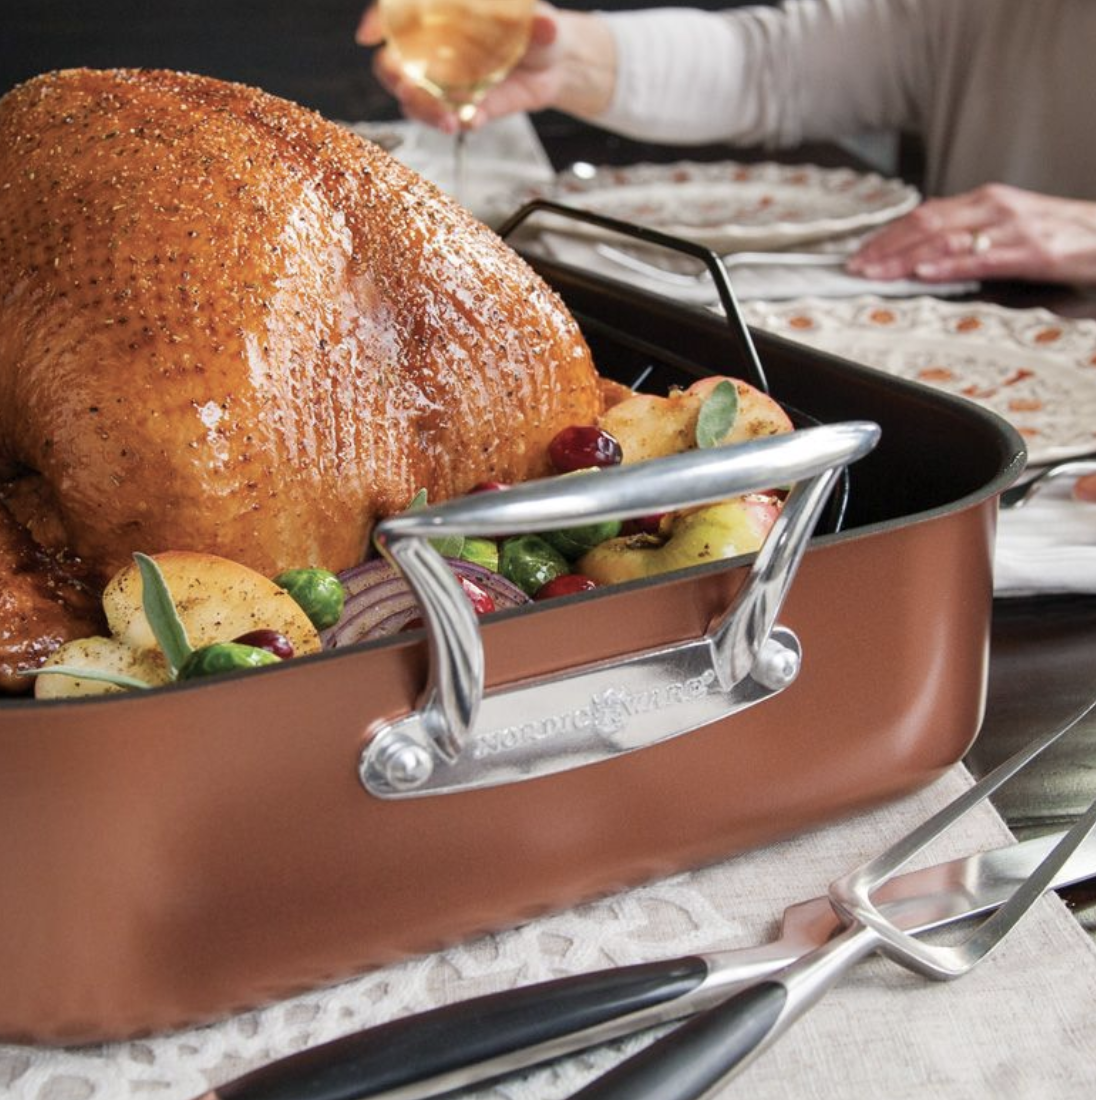 XL Copper Turkey Roaster with Rack